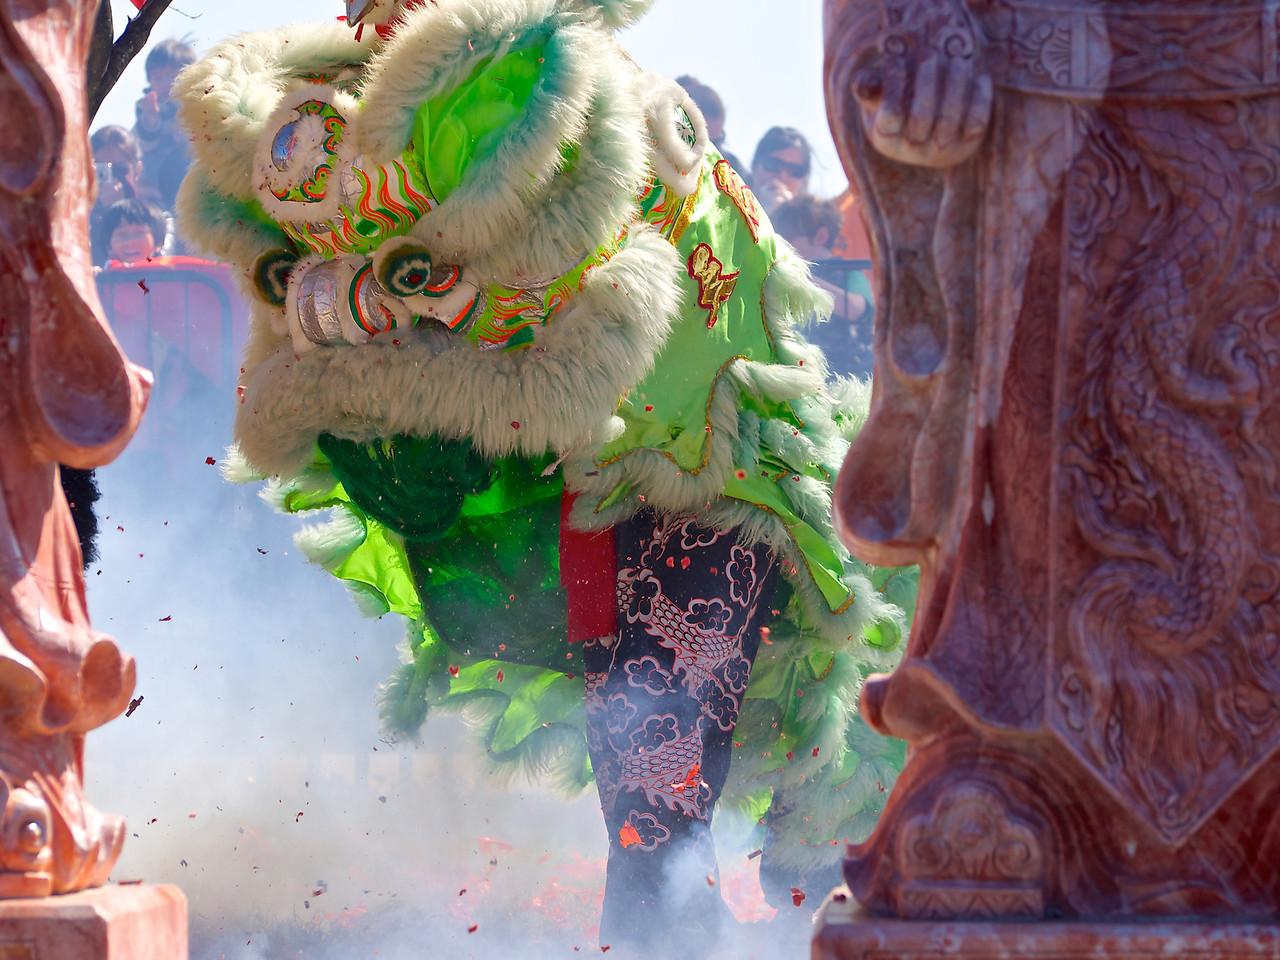 Lion Dance #1, 2013 Chinese New Year Celebration - Austin, Texas